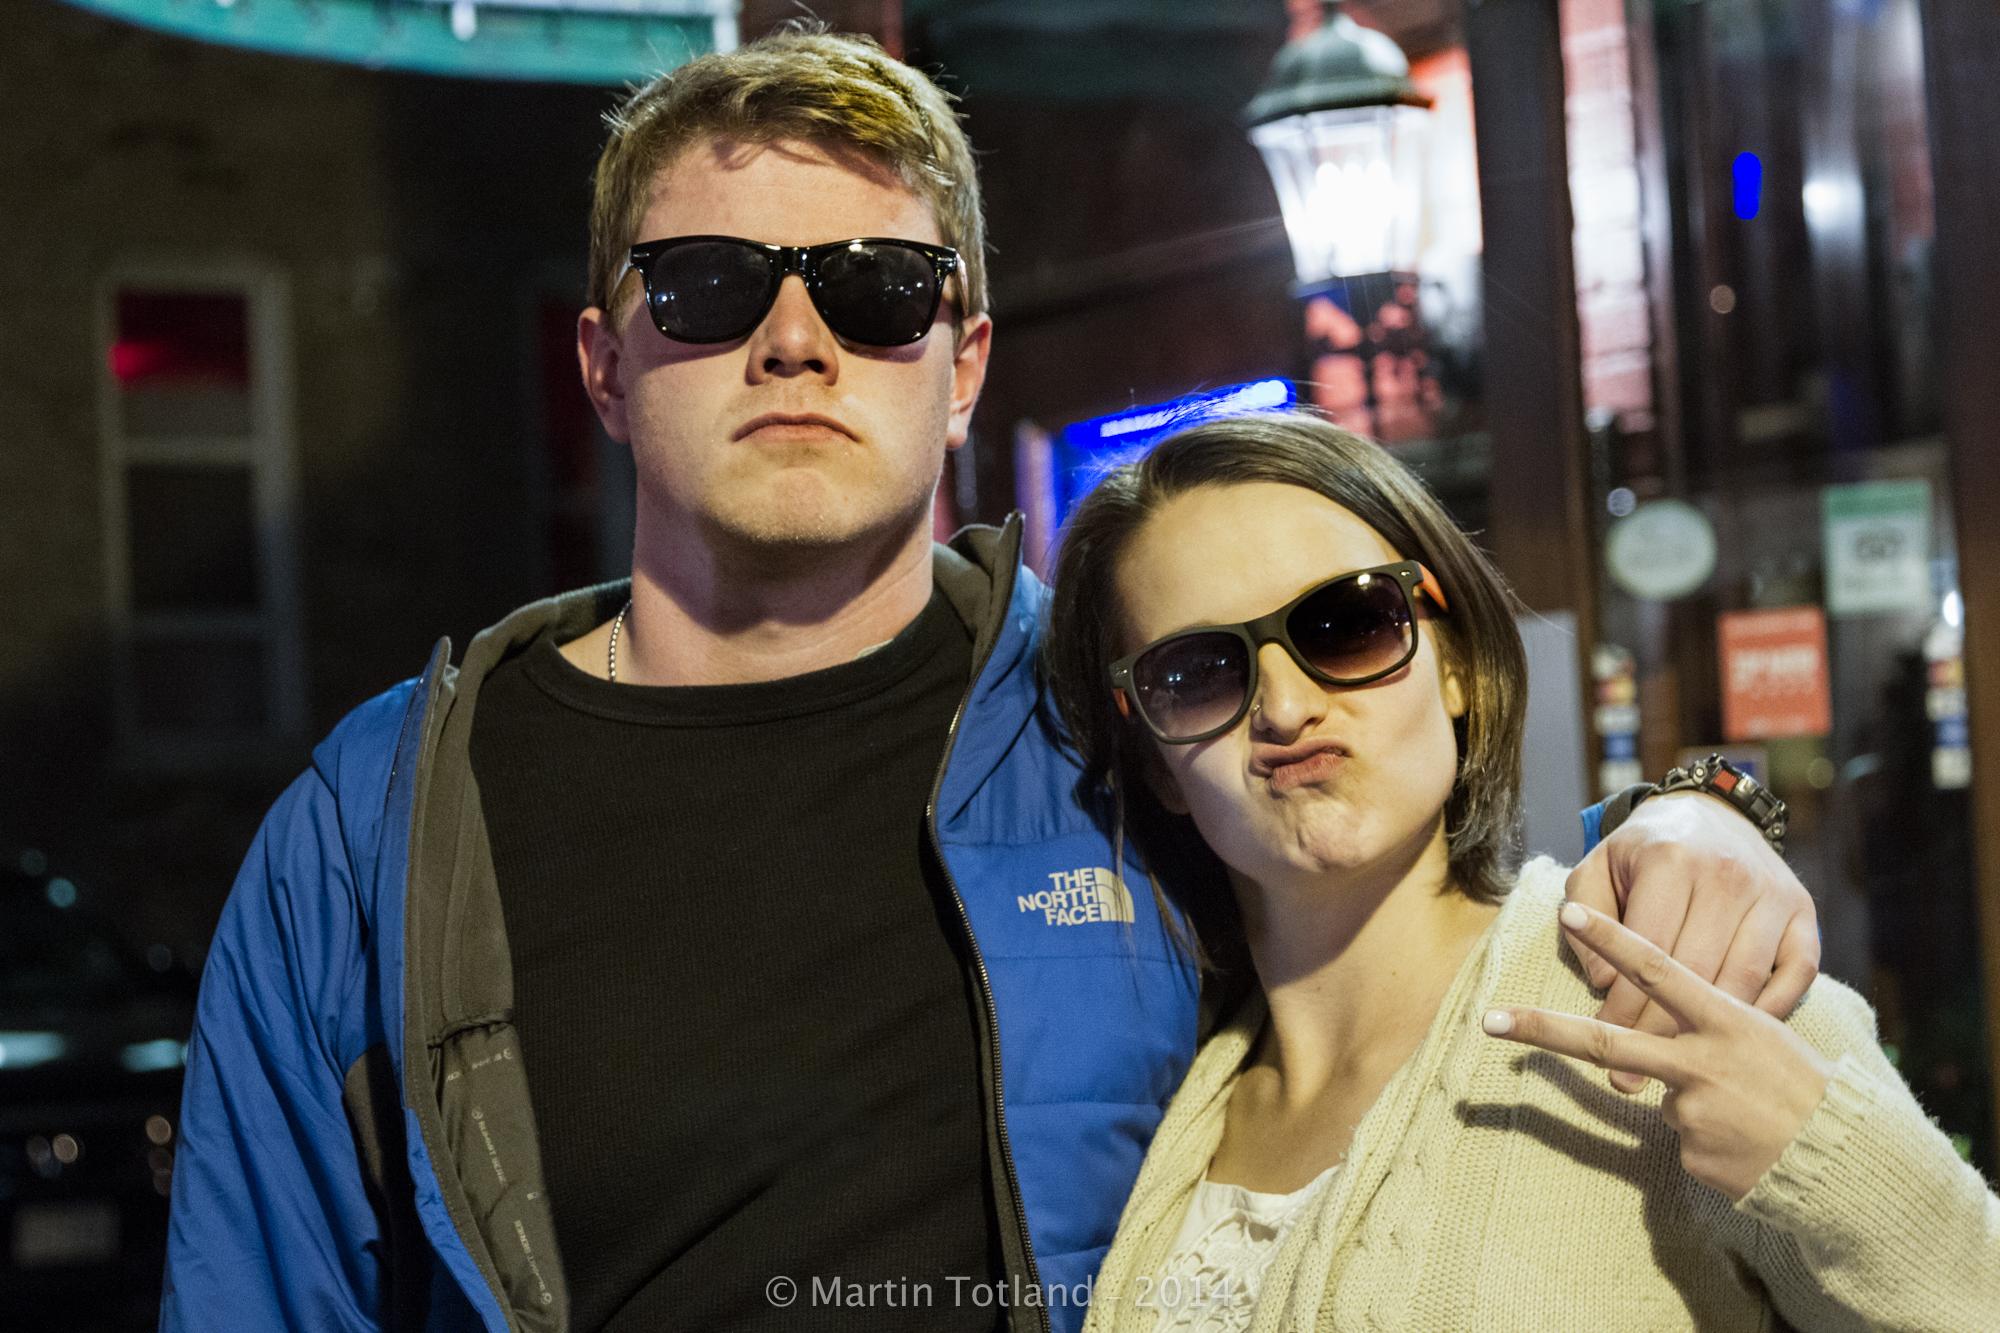 Martin & Brooke